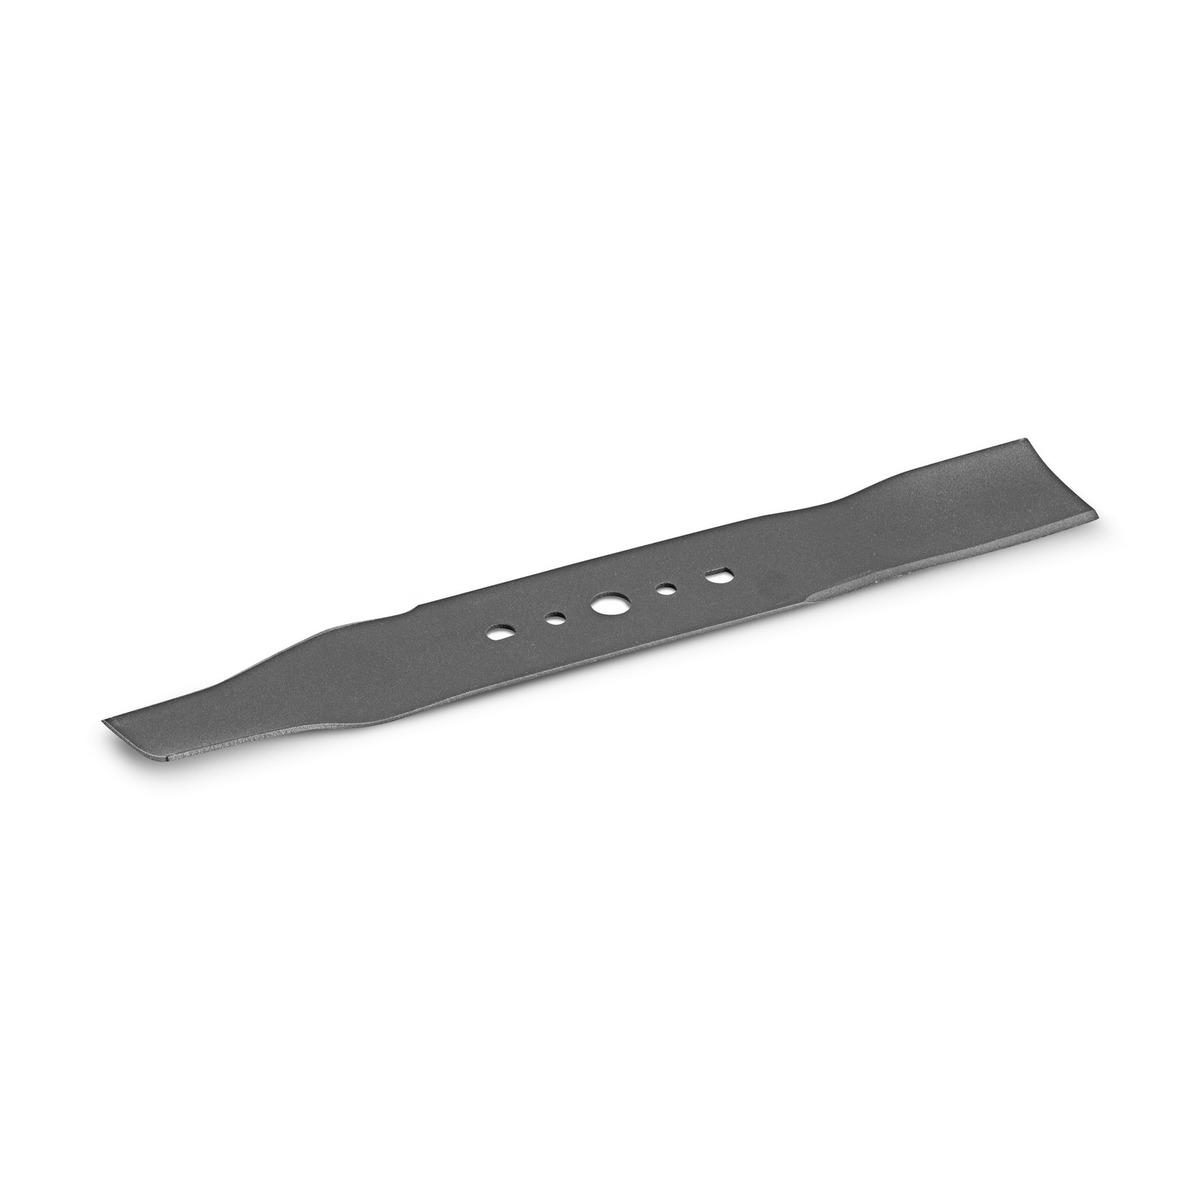 Нож для газонокосилки Karcher LMO 18-33 Battery - 33 см